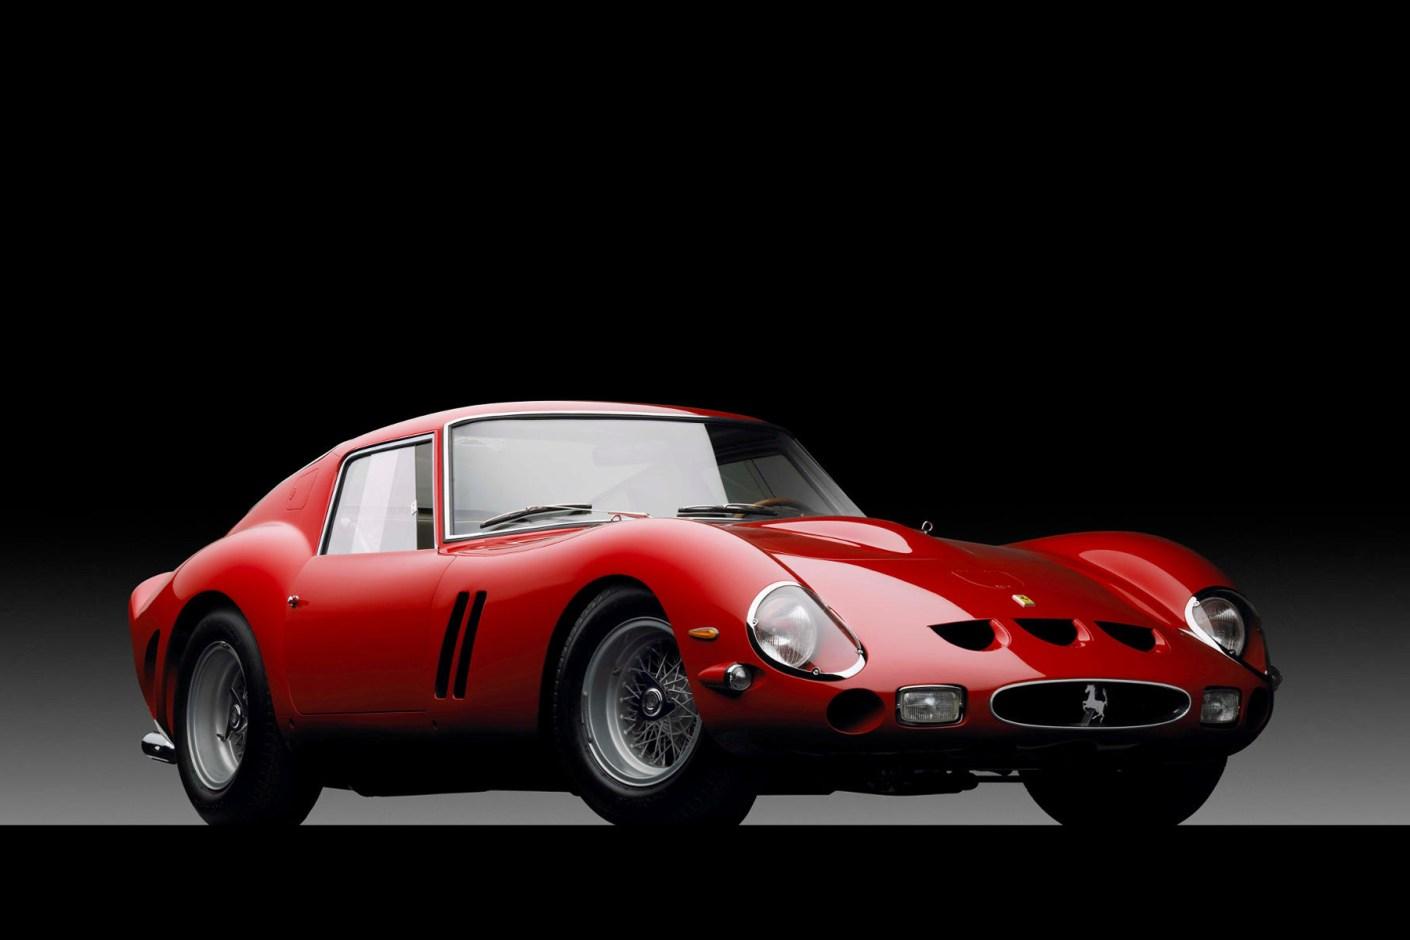 Image of 1962 Ferrari 250 GTO to Hit the Auction Block for €40 Million Euros